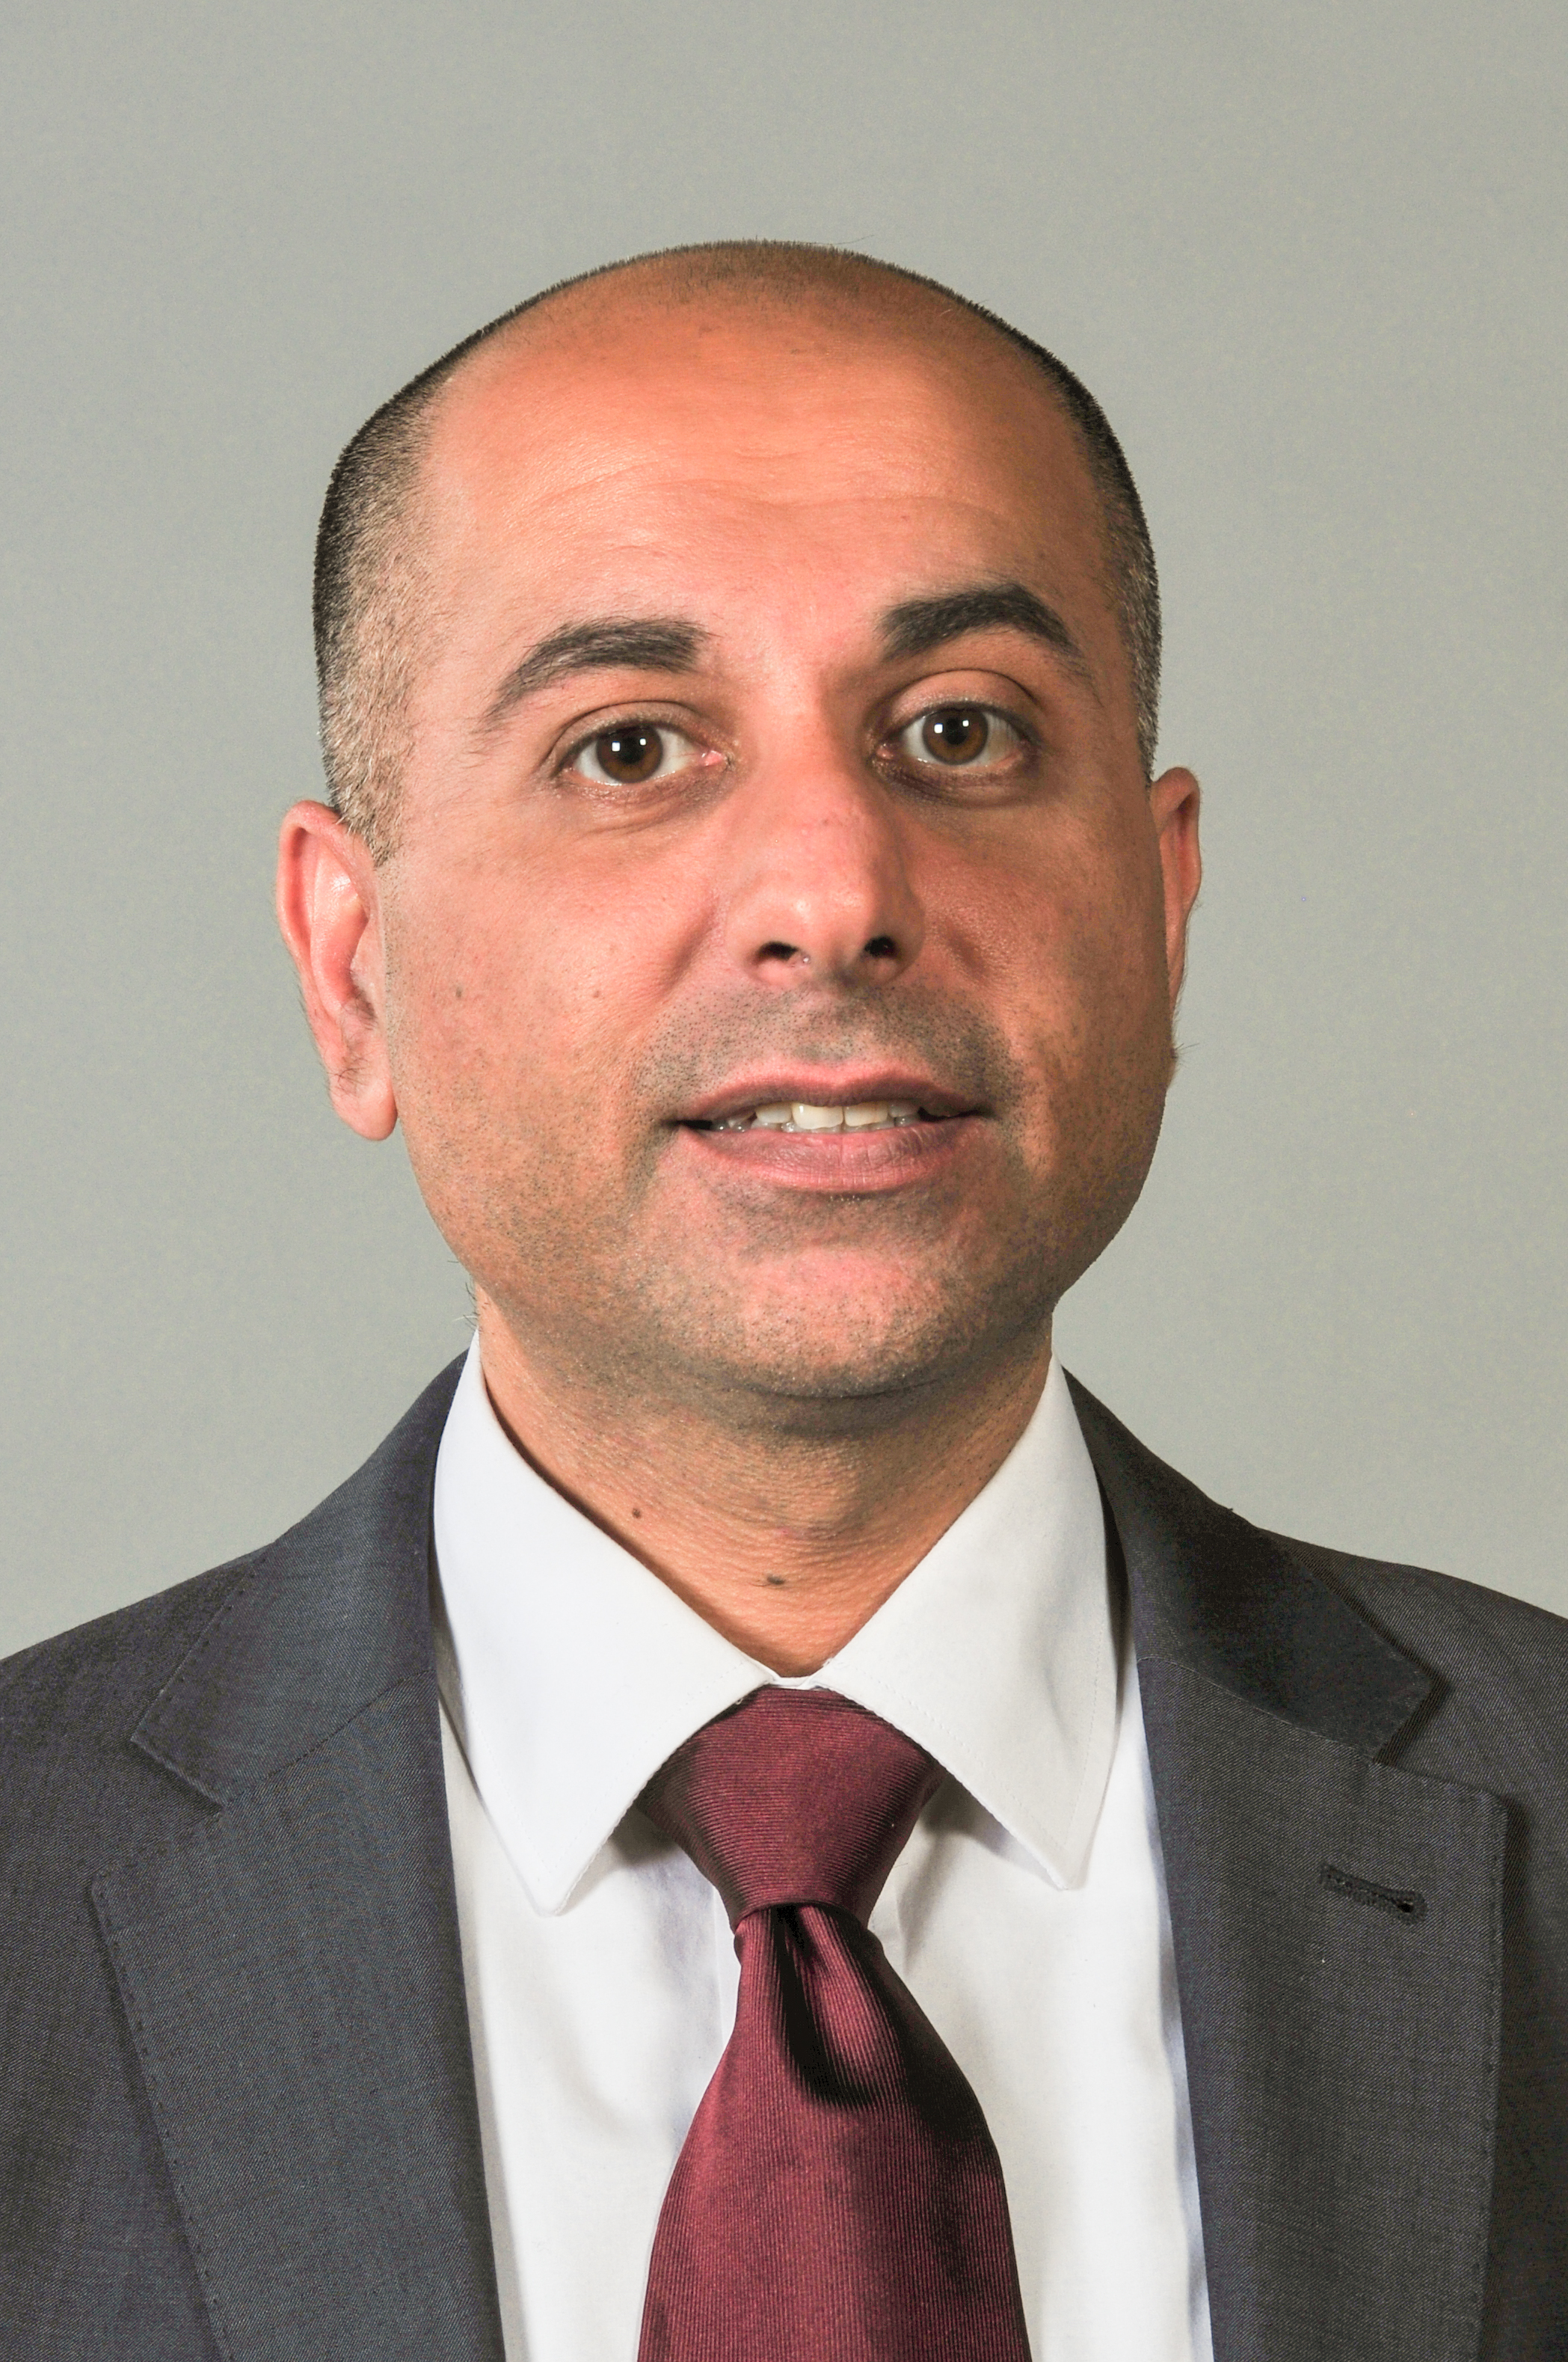 Sajjad Karim - Wikipedia